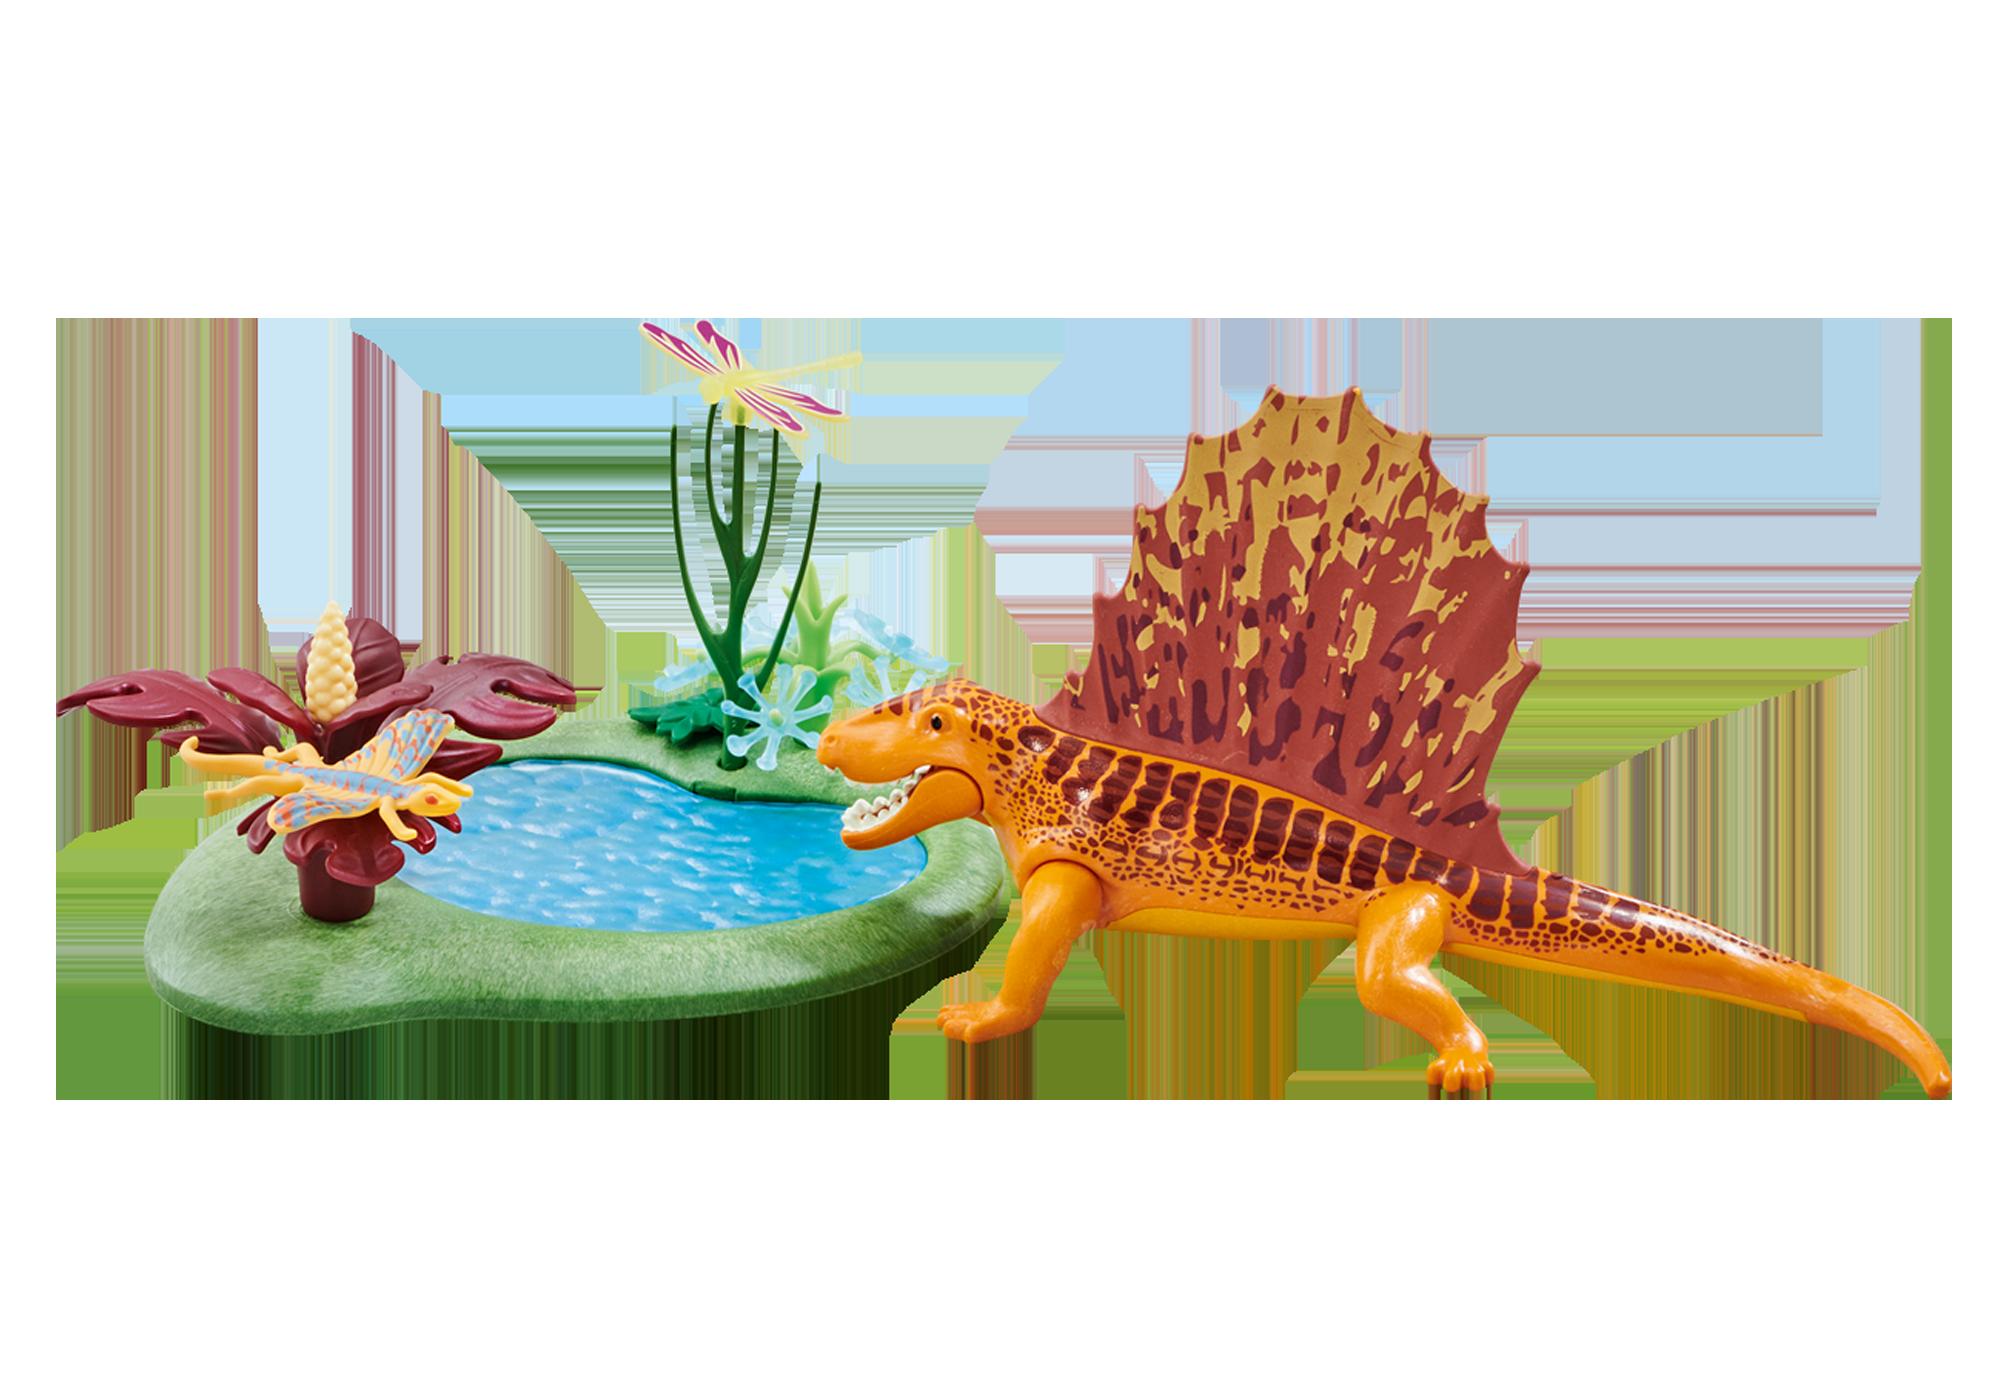 http://media.playmobil.com/i/playmobil/6596_product_detail/Dimetrodon with Pond